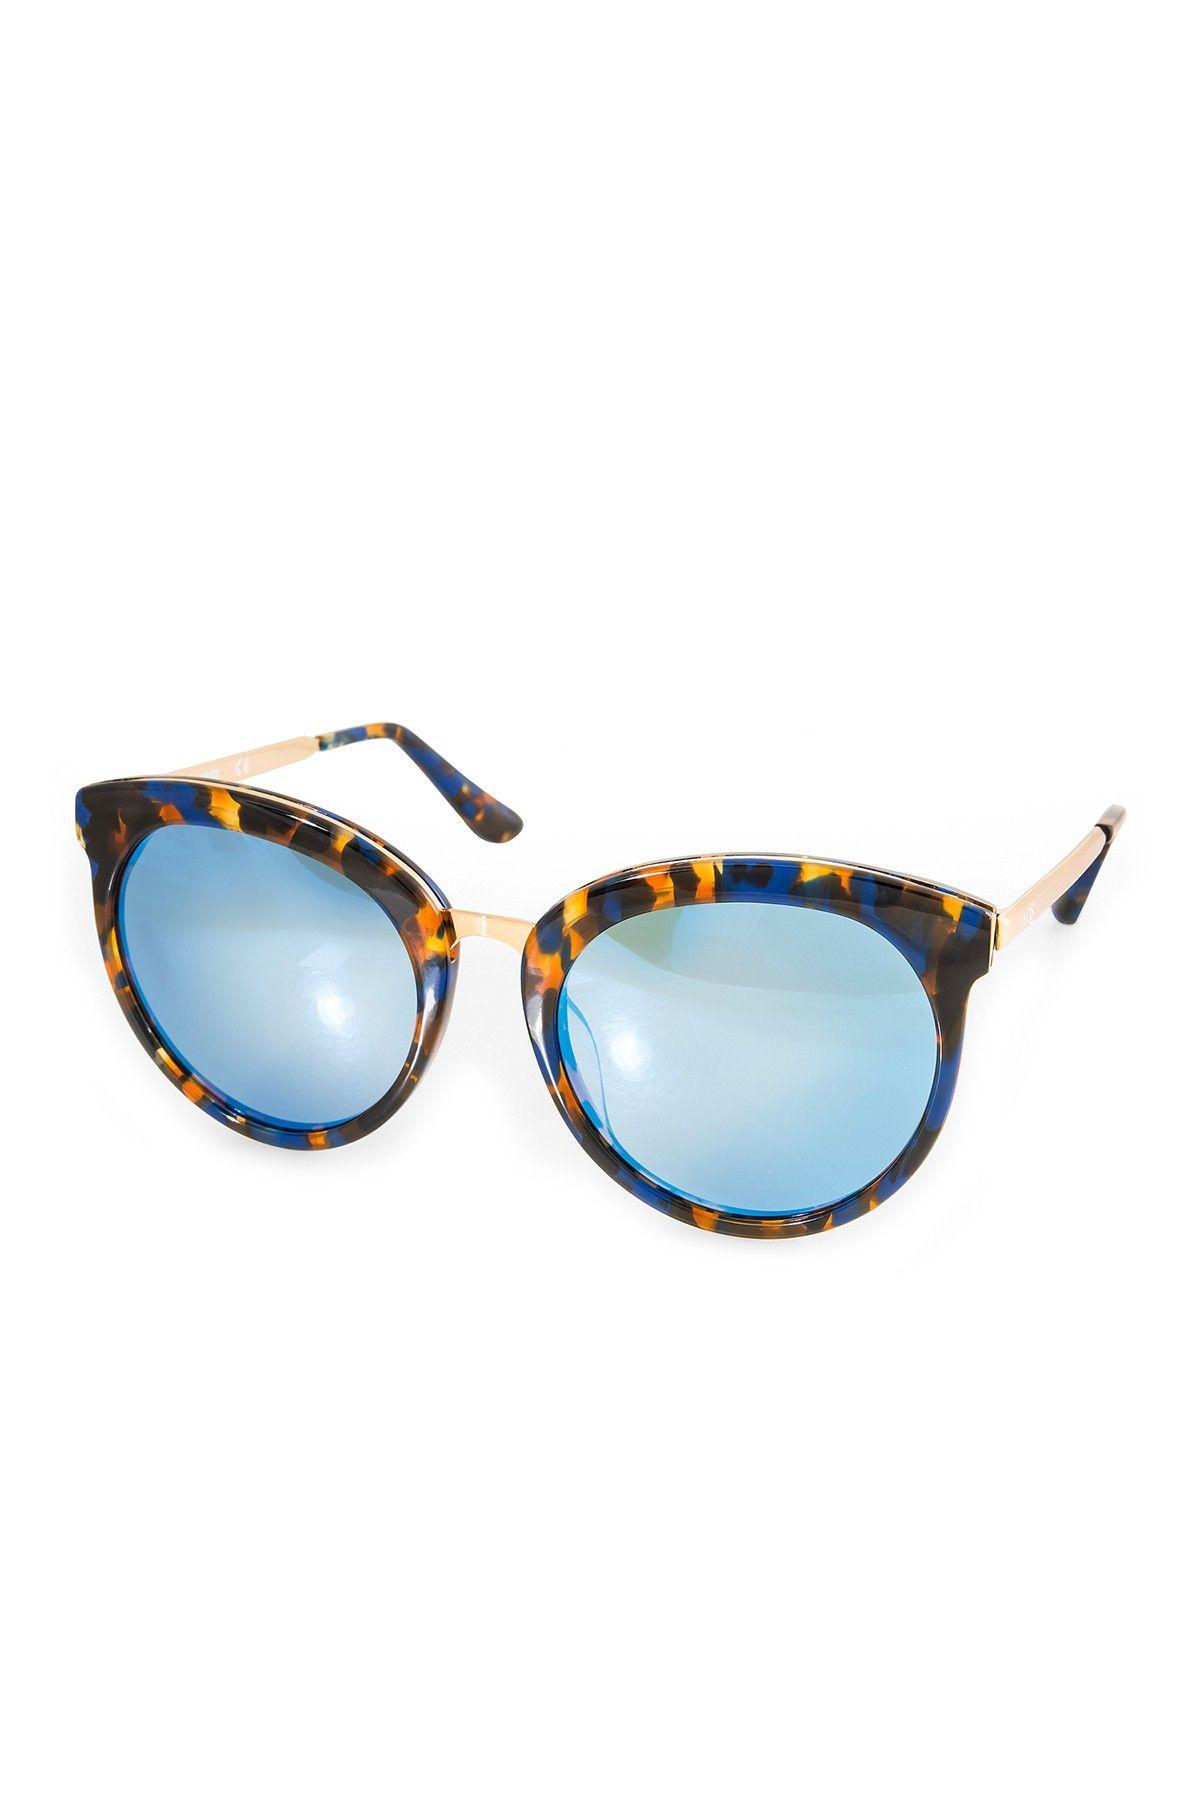 AQS Sunglasses | Women's Poppy Round Sunglasses | Nordstrom Rack